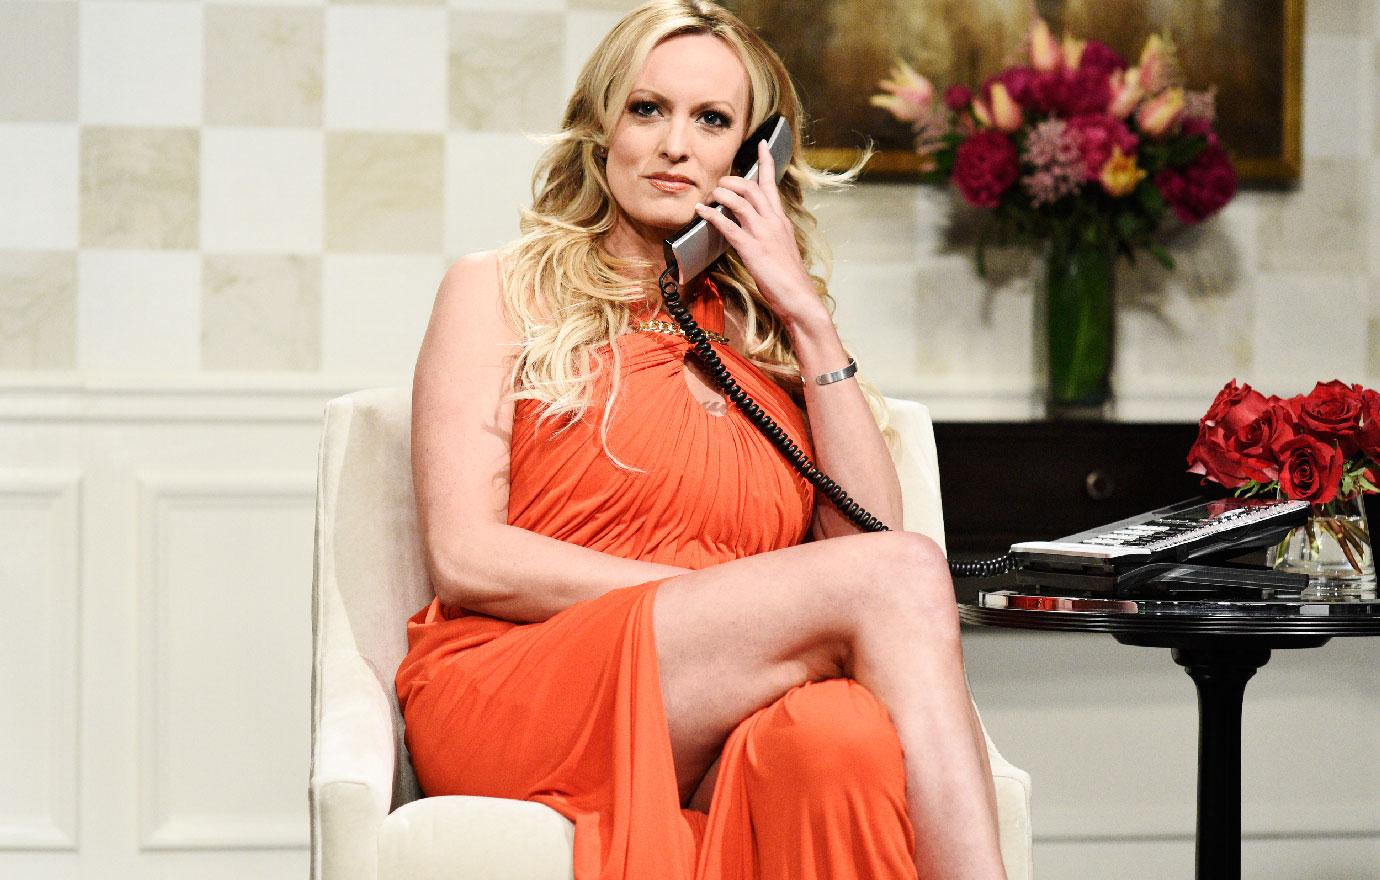 Stormy Daniels Appears Saturday Night Live